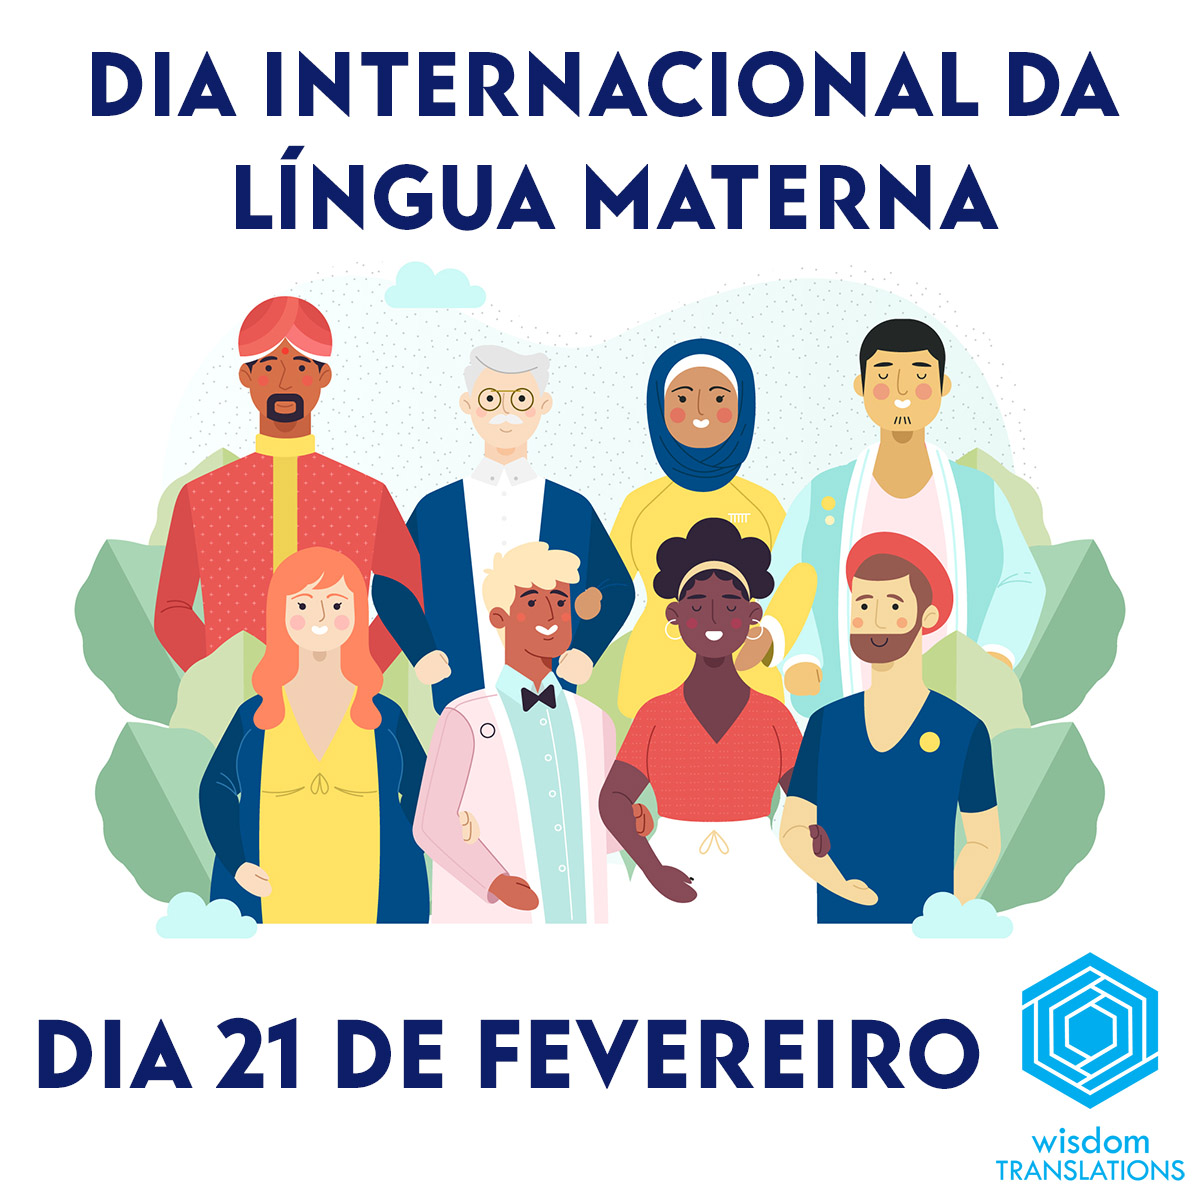 Dia Internacional da Língua Materna: 5 Vantagens de Recorrer a Tradutores Nativos